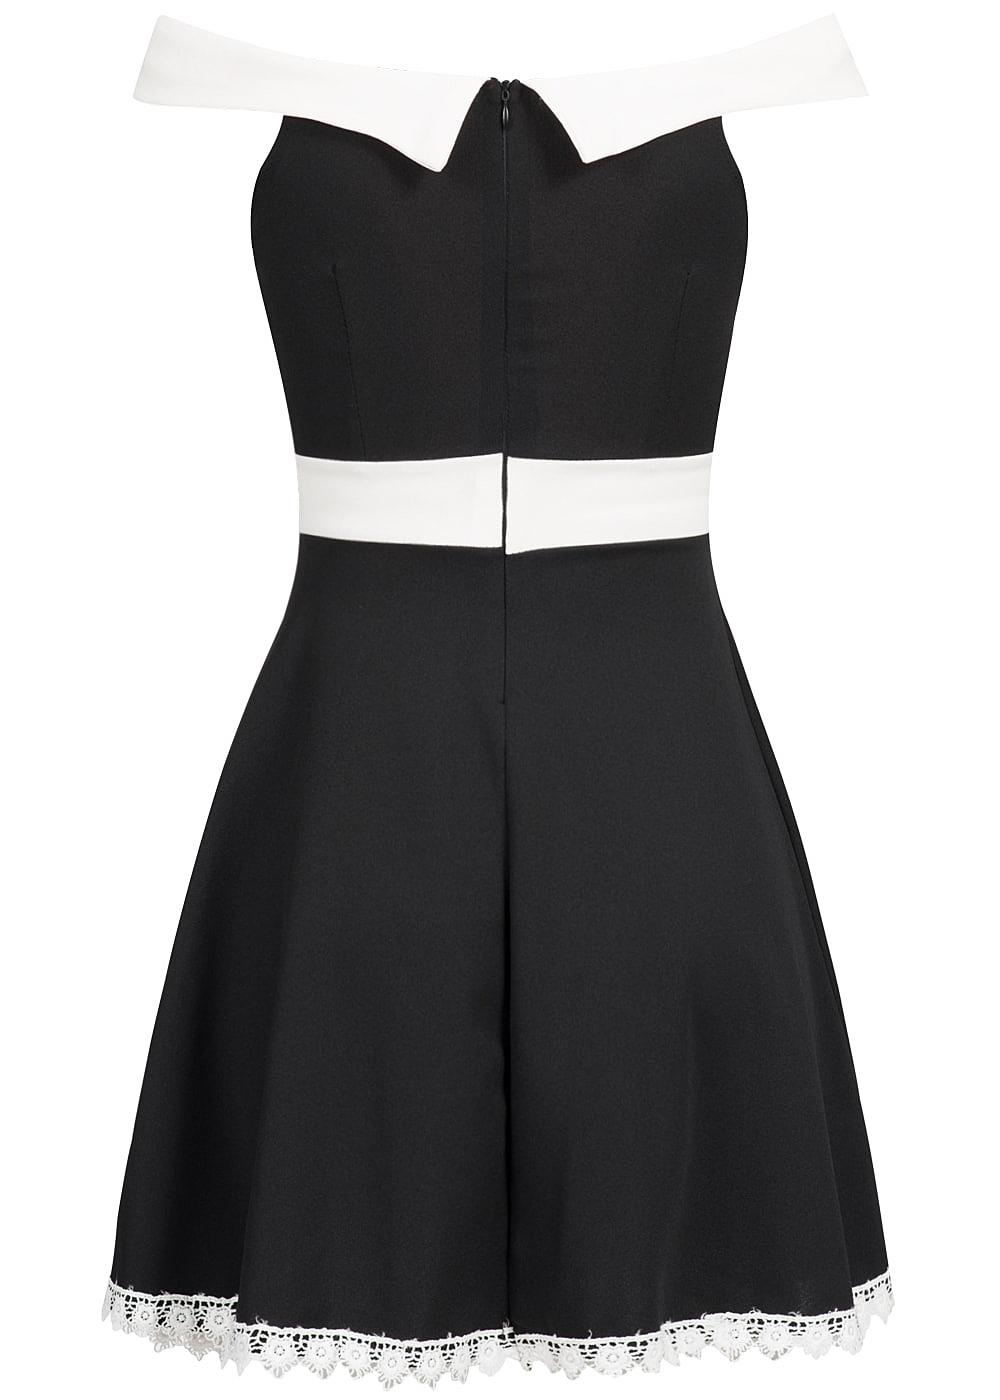 styleboom fashion damen mini kleid off shoulder zipper deko schleife brustpads schwarz. Black Bedroom Furniture Sets. Home Design Ideas